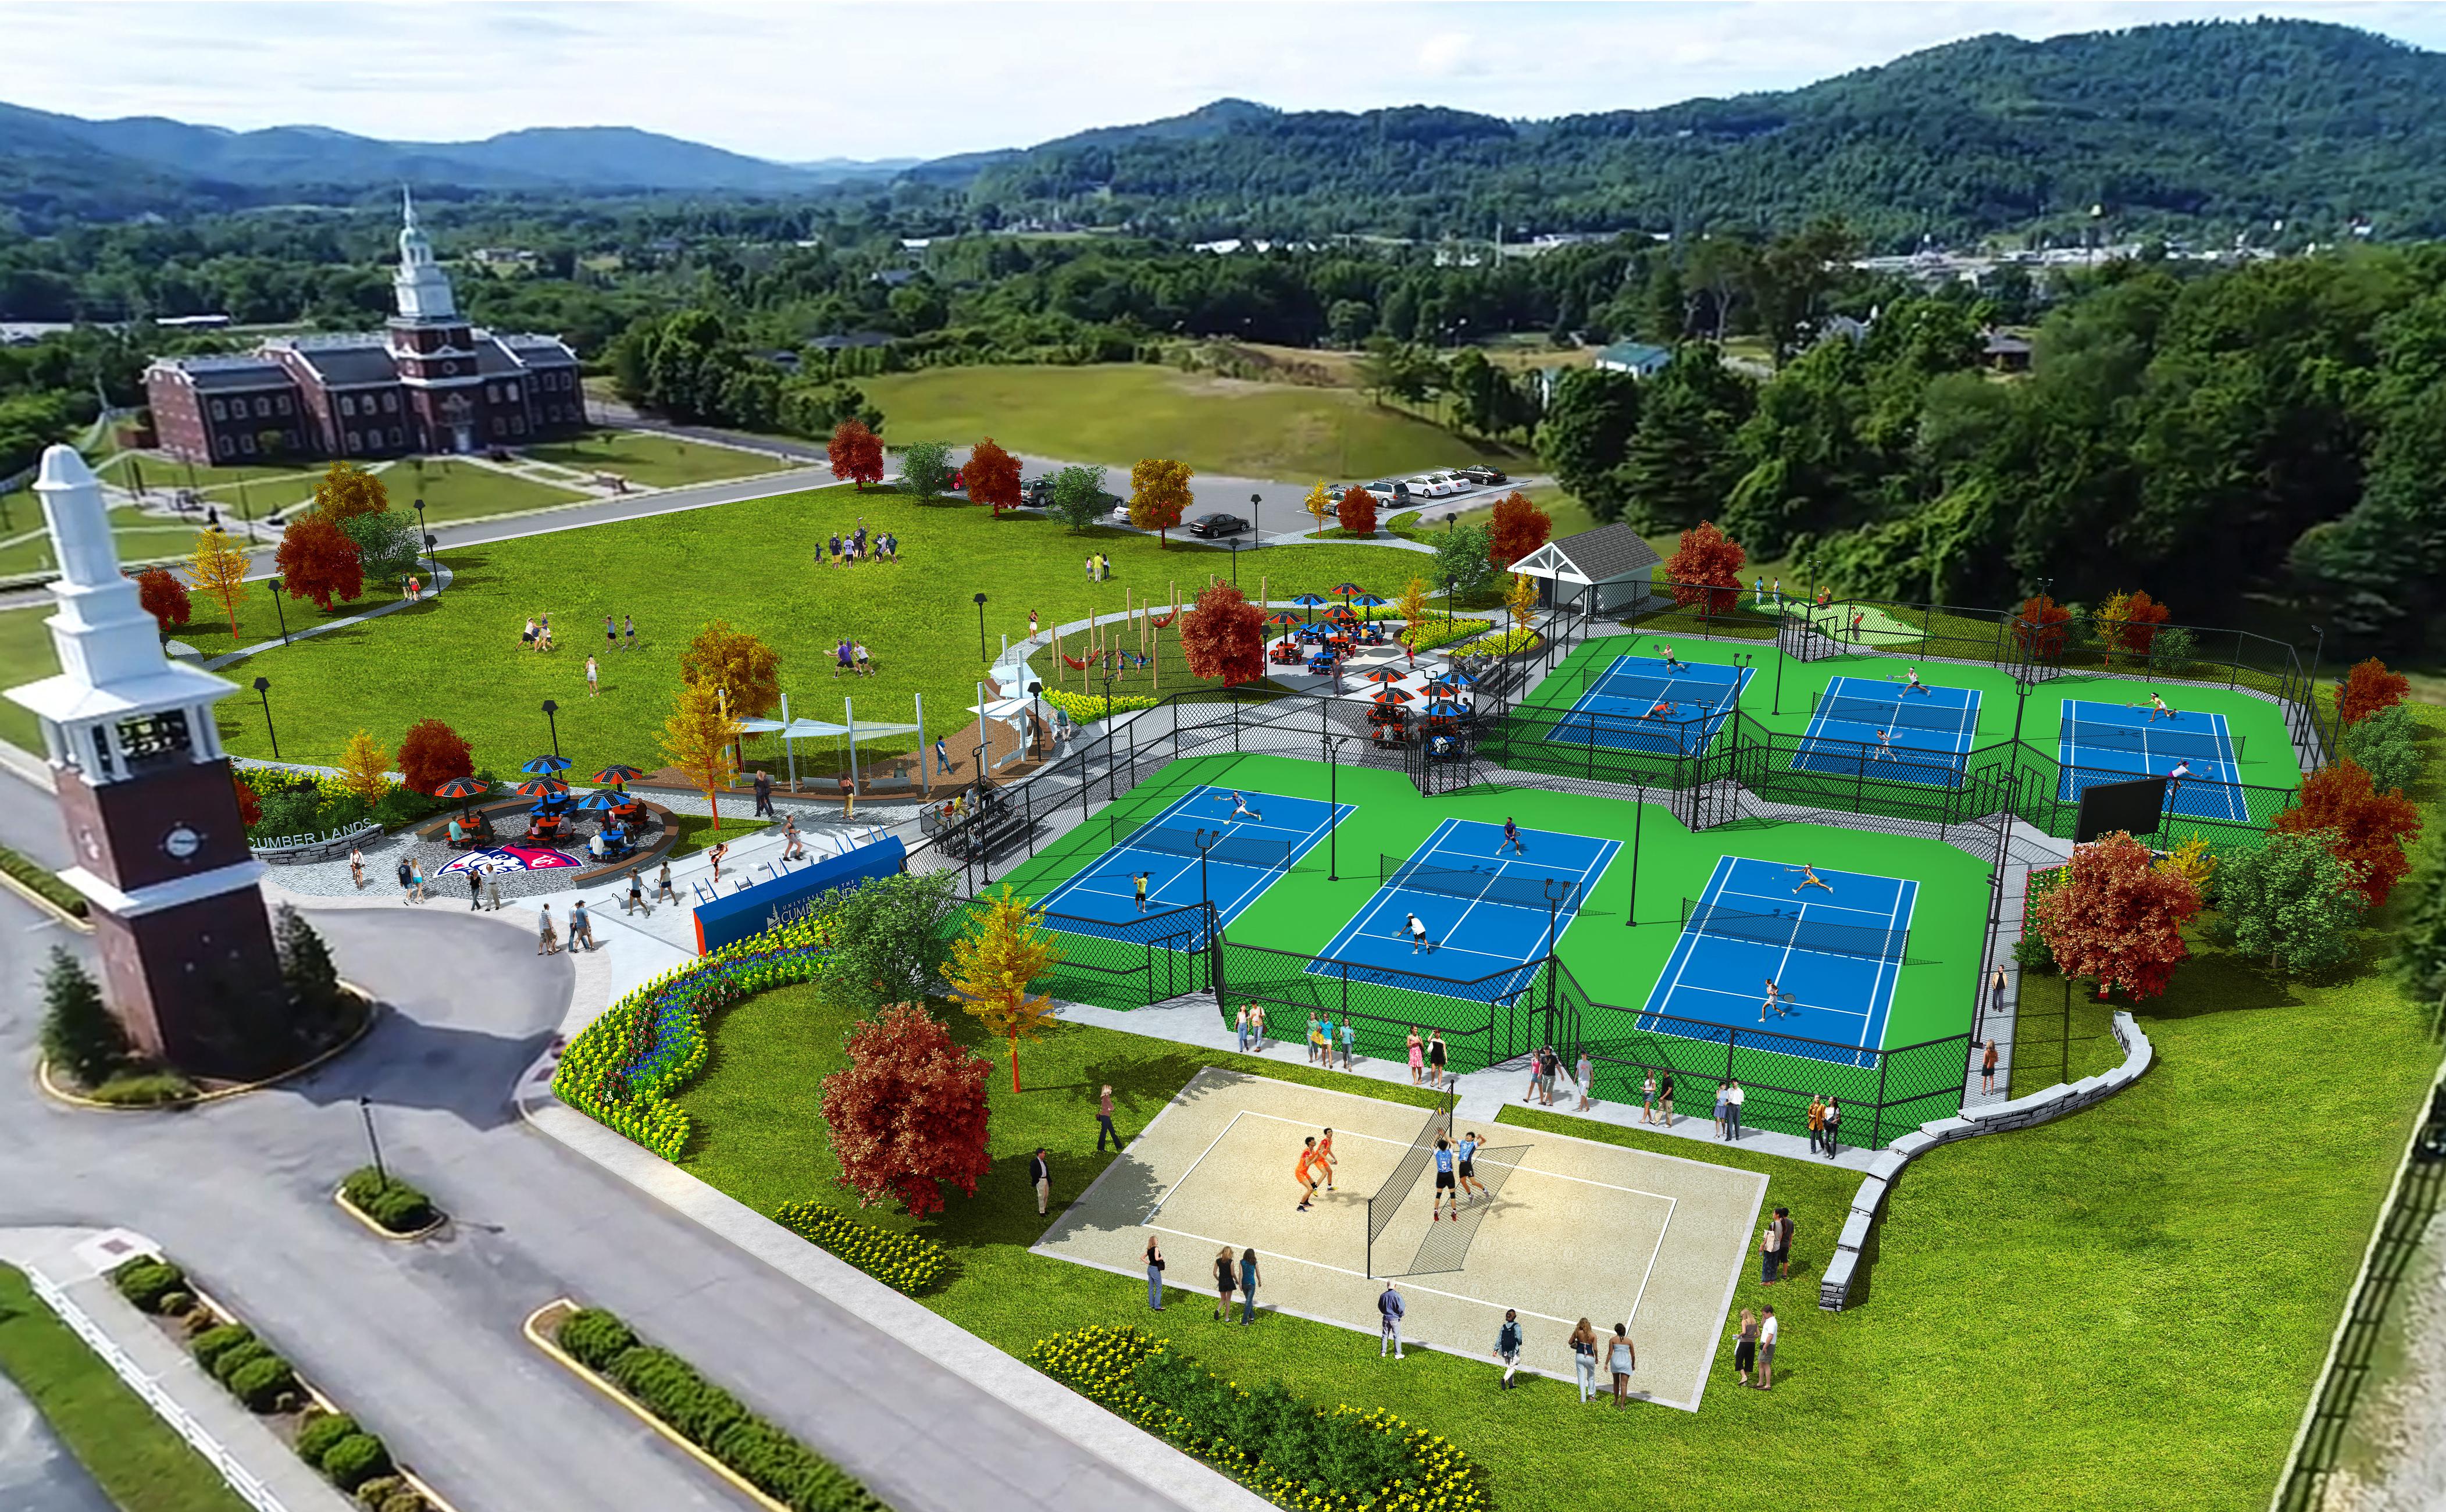 University of Cumberland Tennis Complex